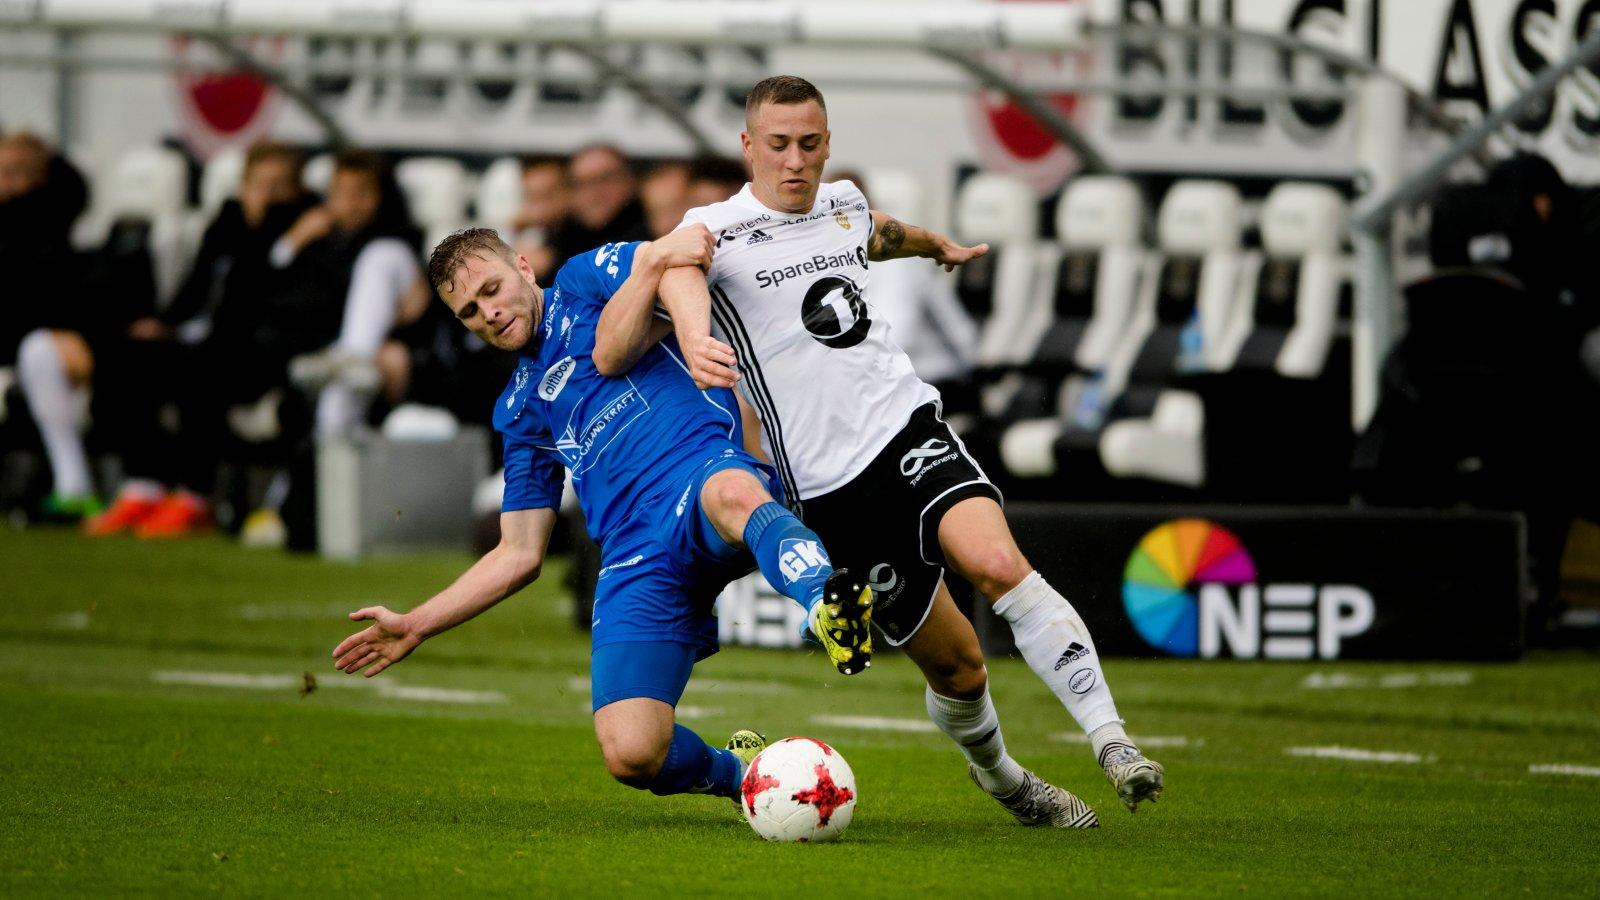 Kampfakta Rosenborg - FK Haugesund / Haugesund